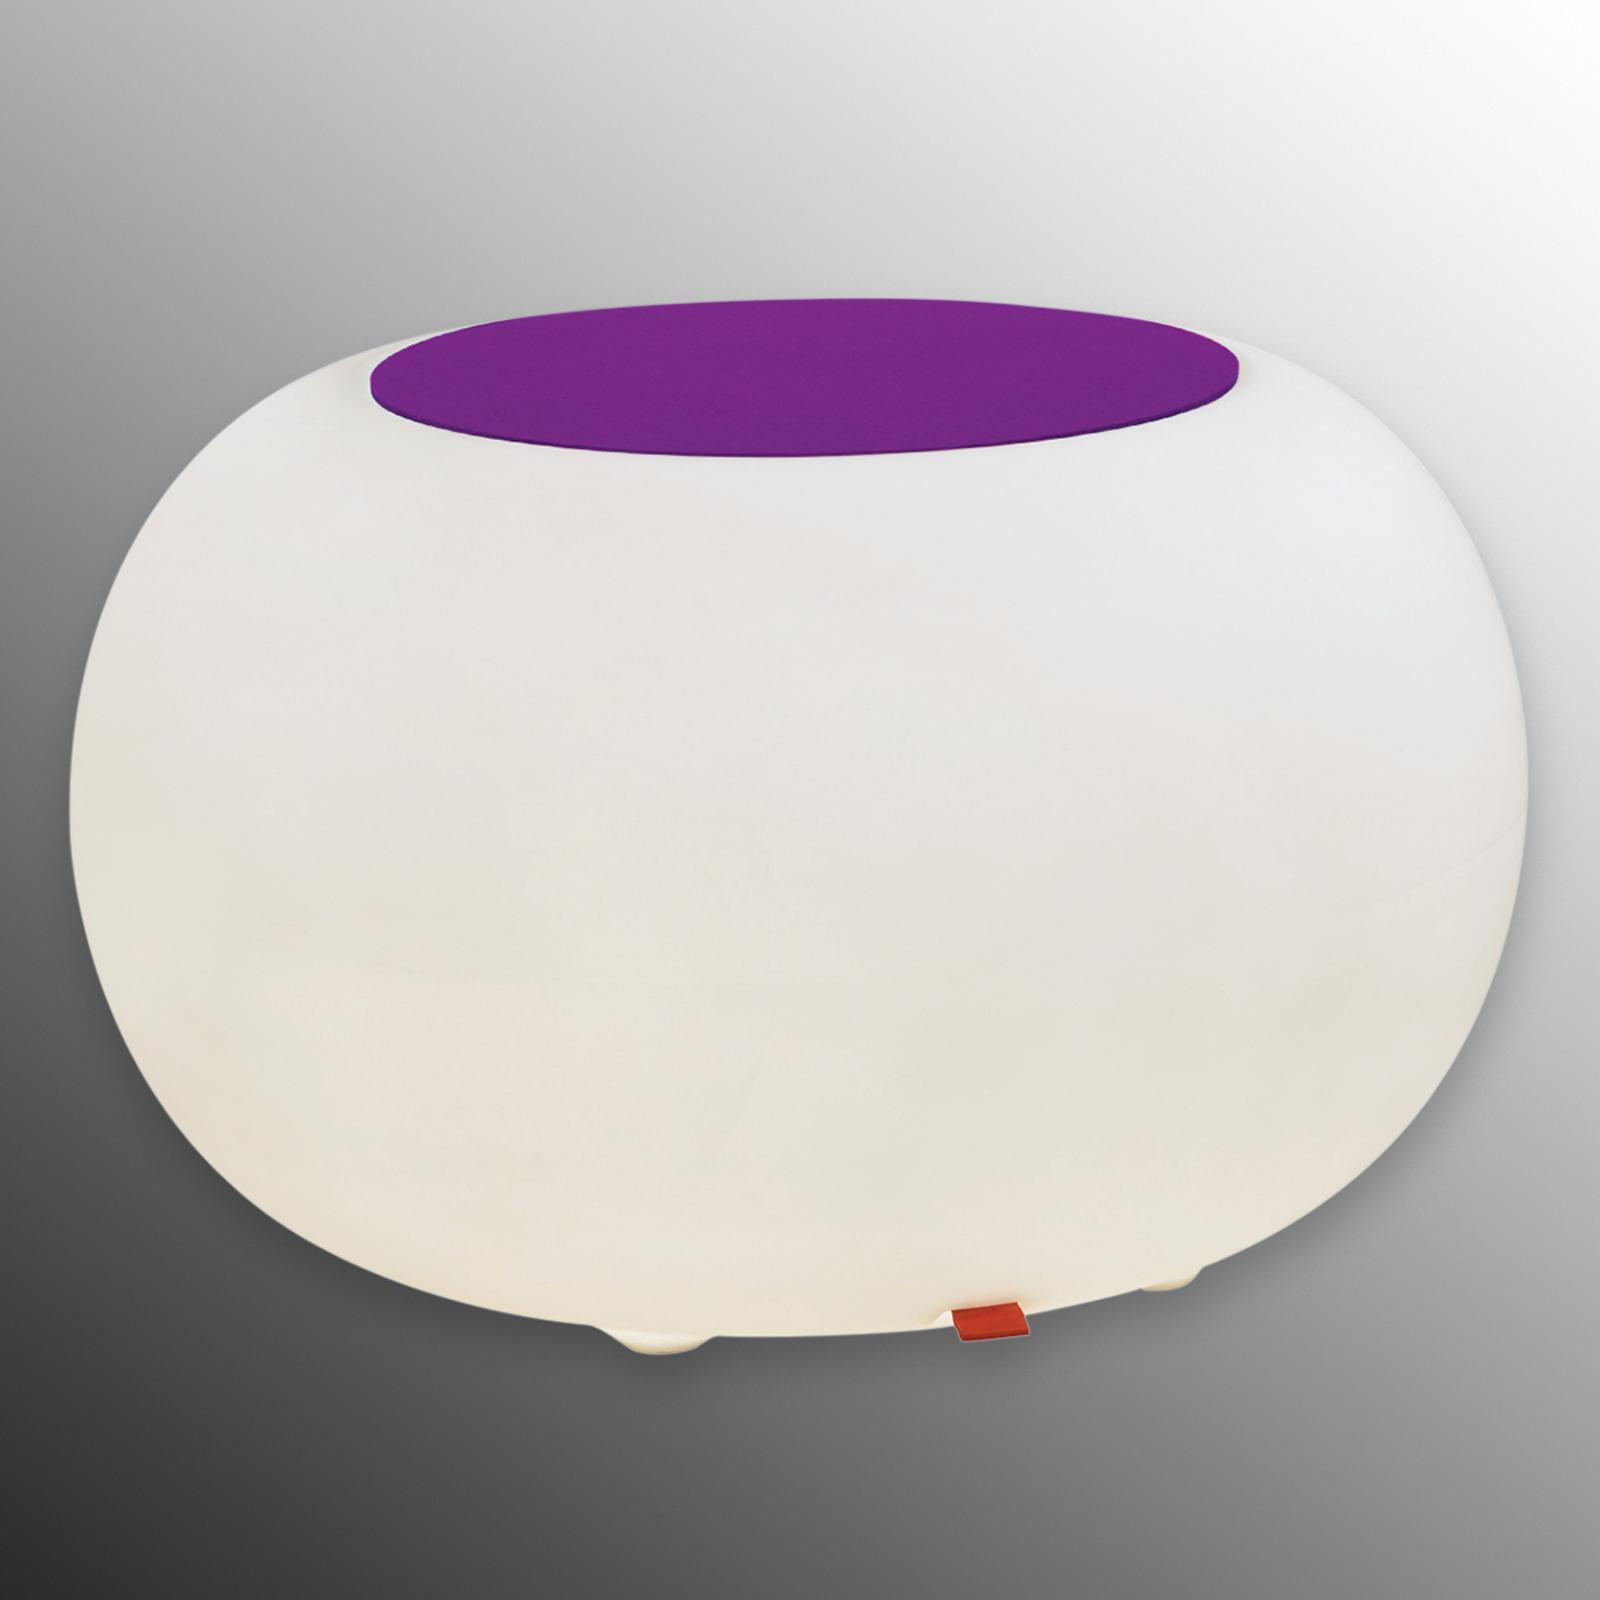 Tisch BUBBLE Indoor E27 Lampe + Filz violett